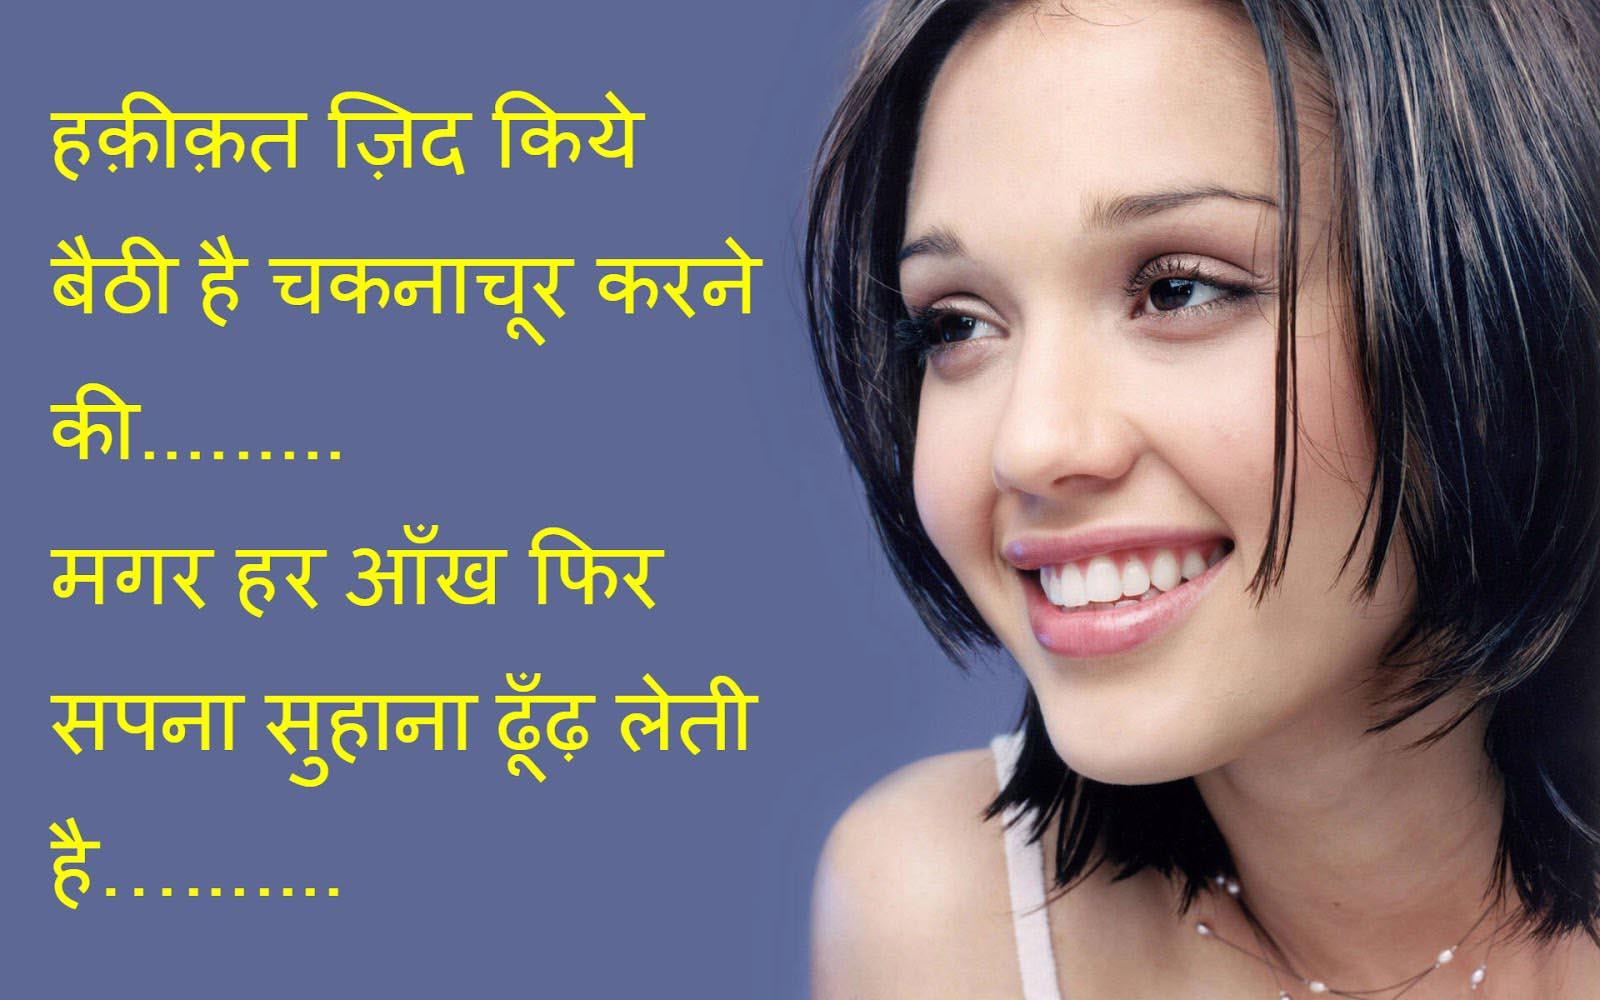 100+ Hindi Shayri DP Images and Status for Whatsapp FB